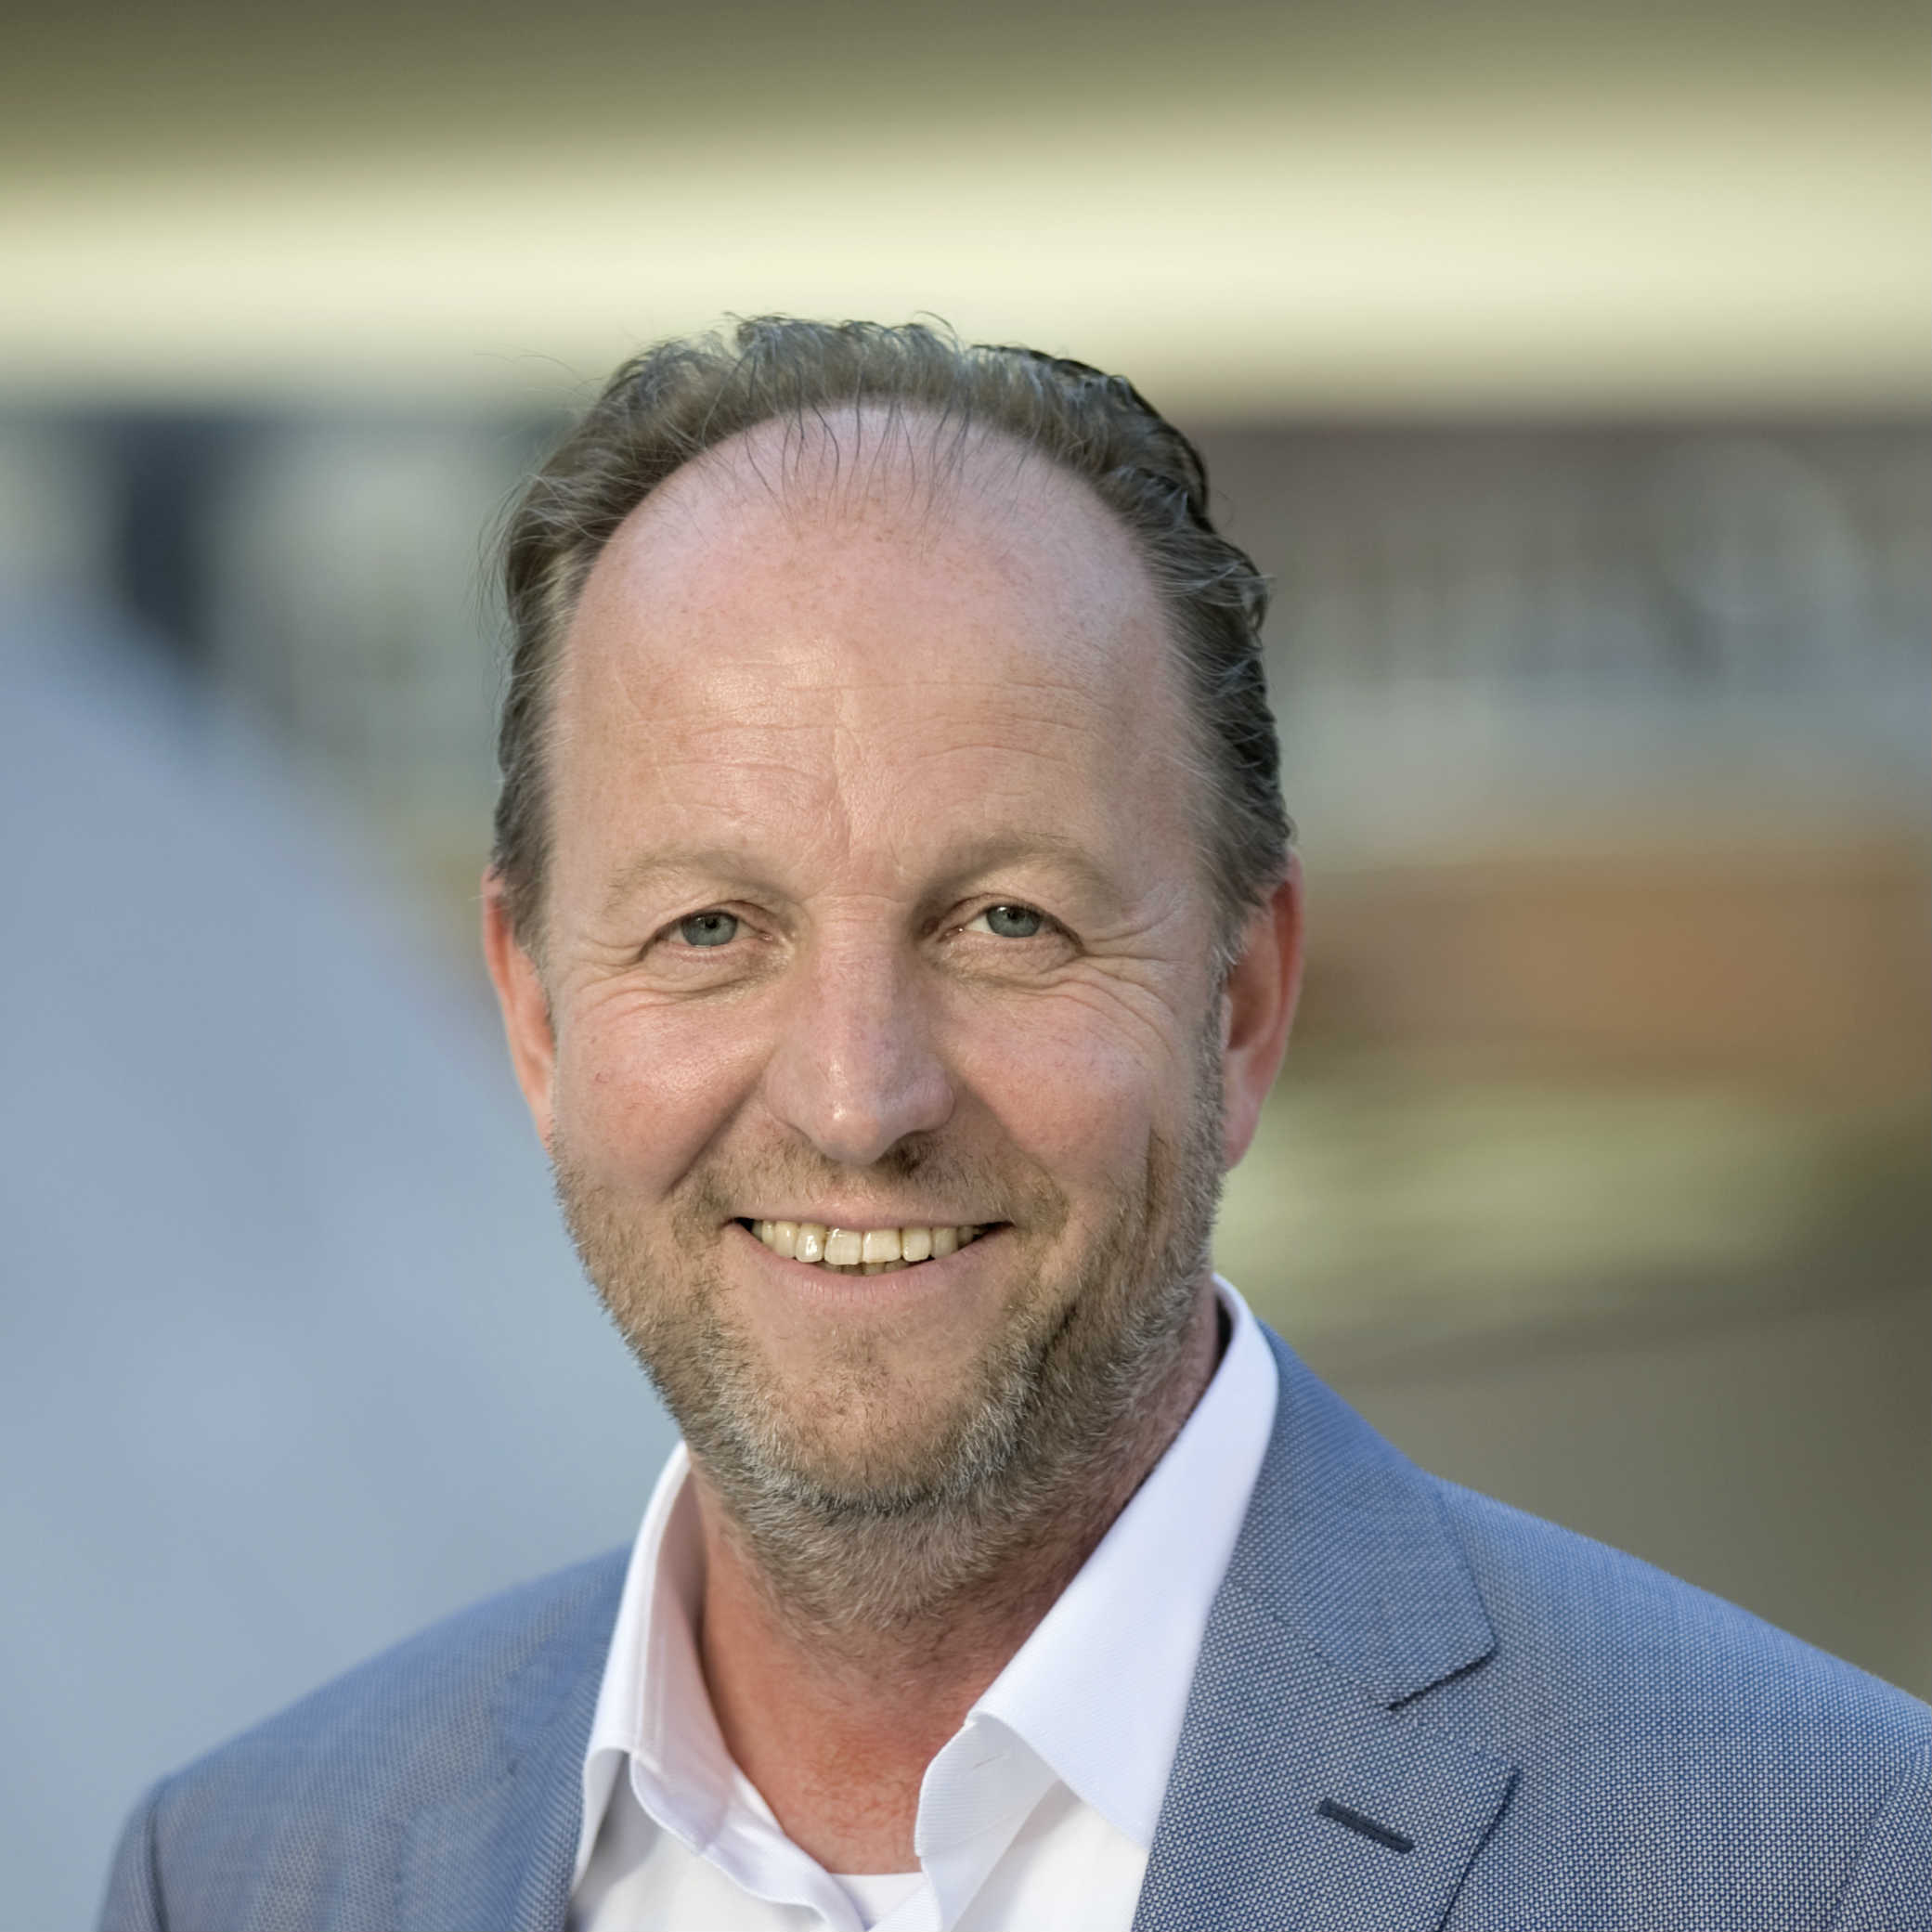 Rebus Jan Bruwier